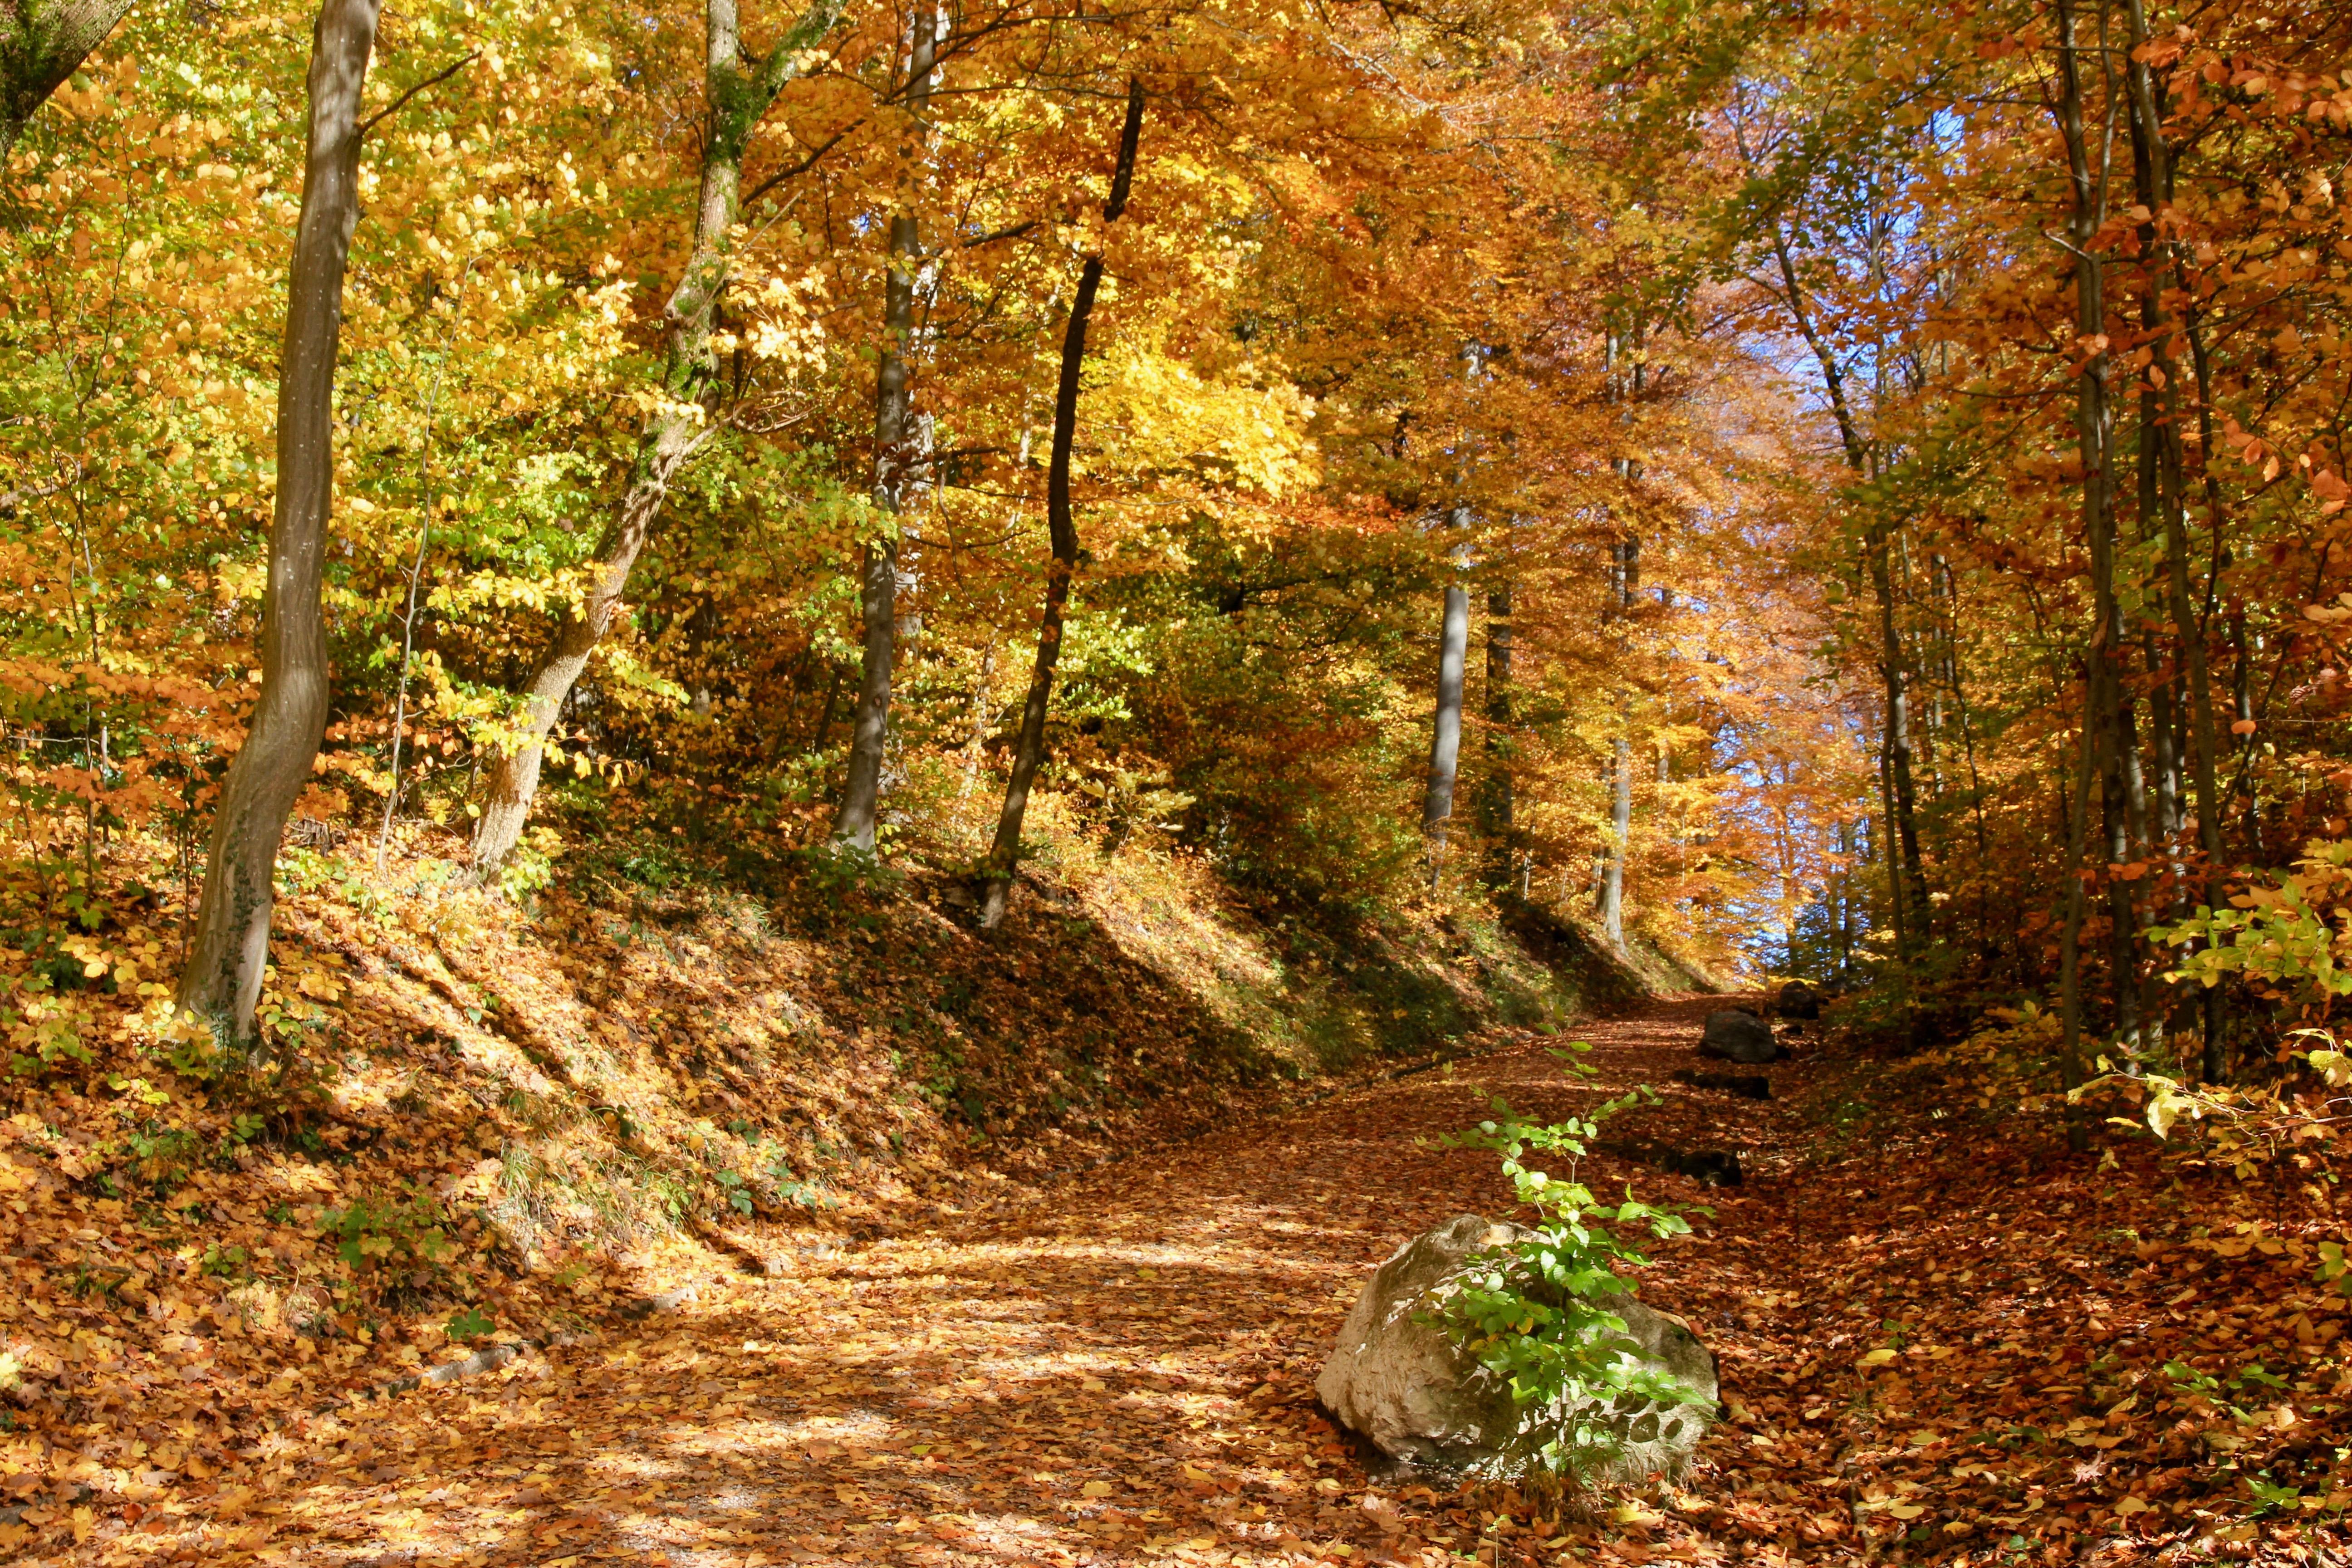 Zurigo in autunno